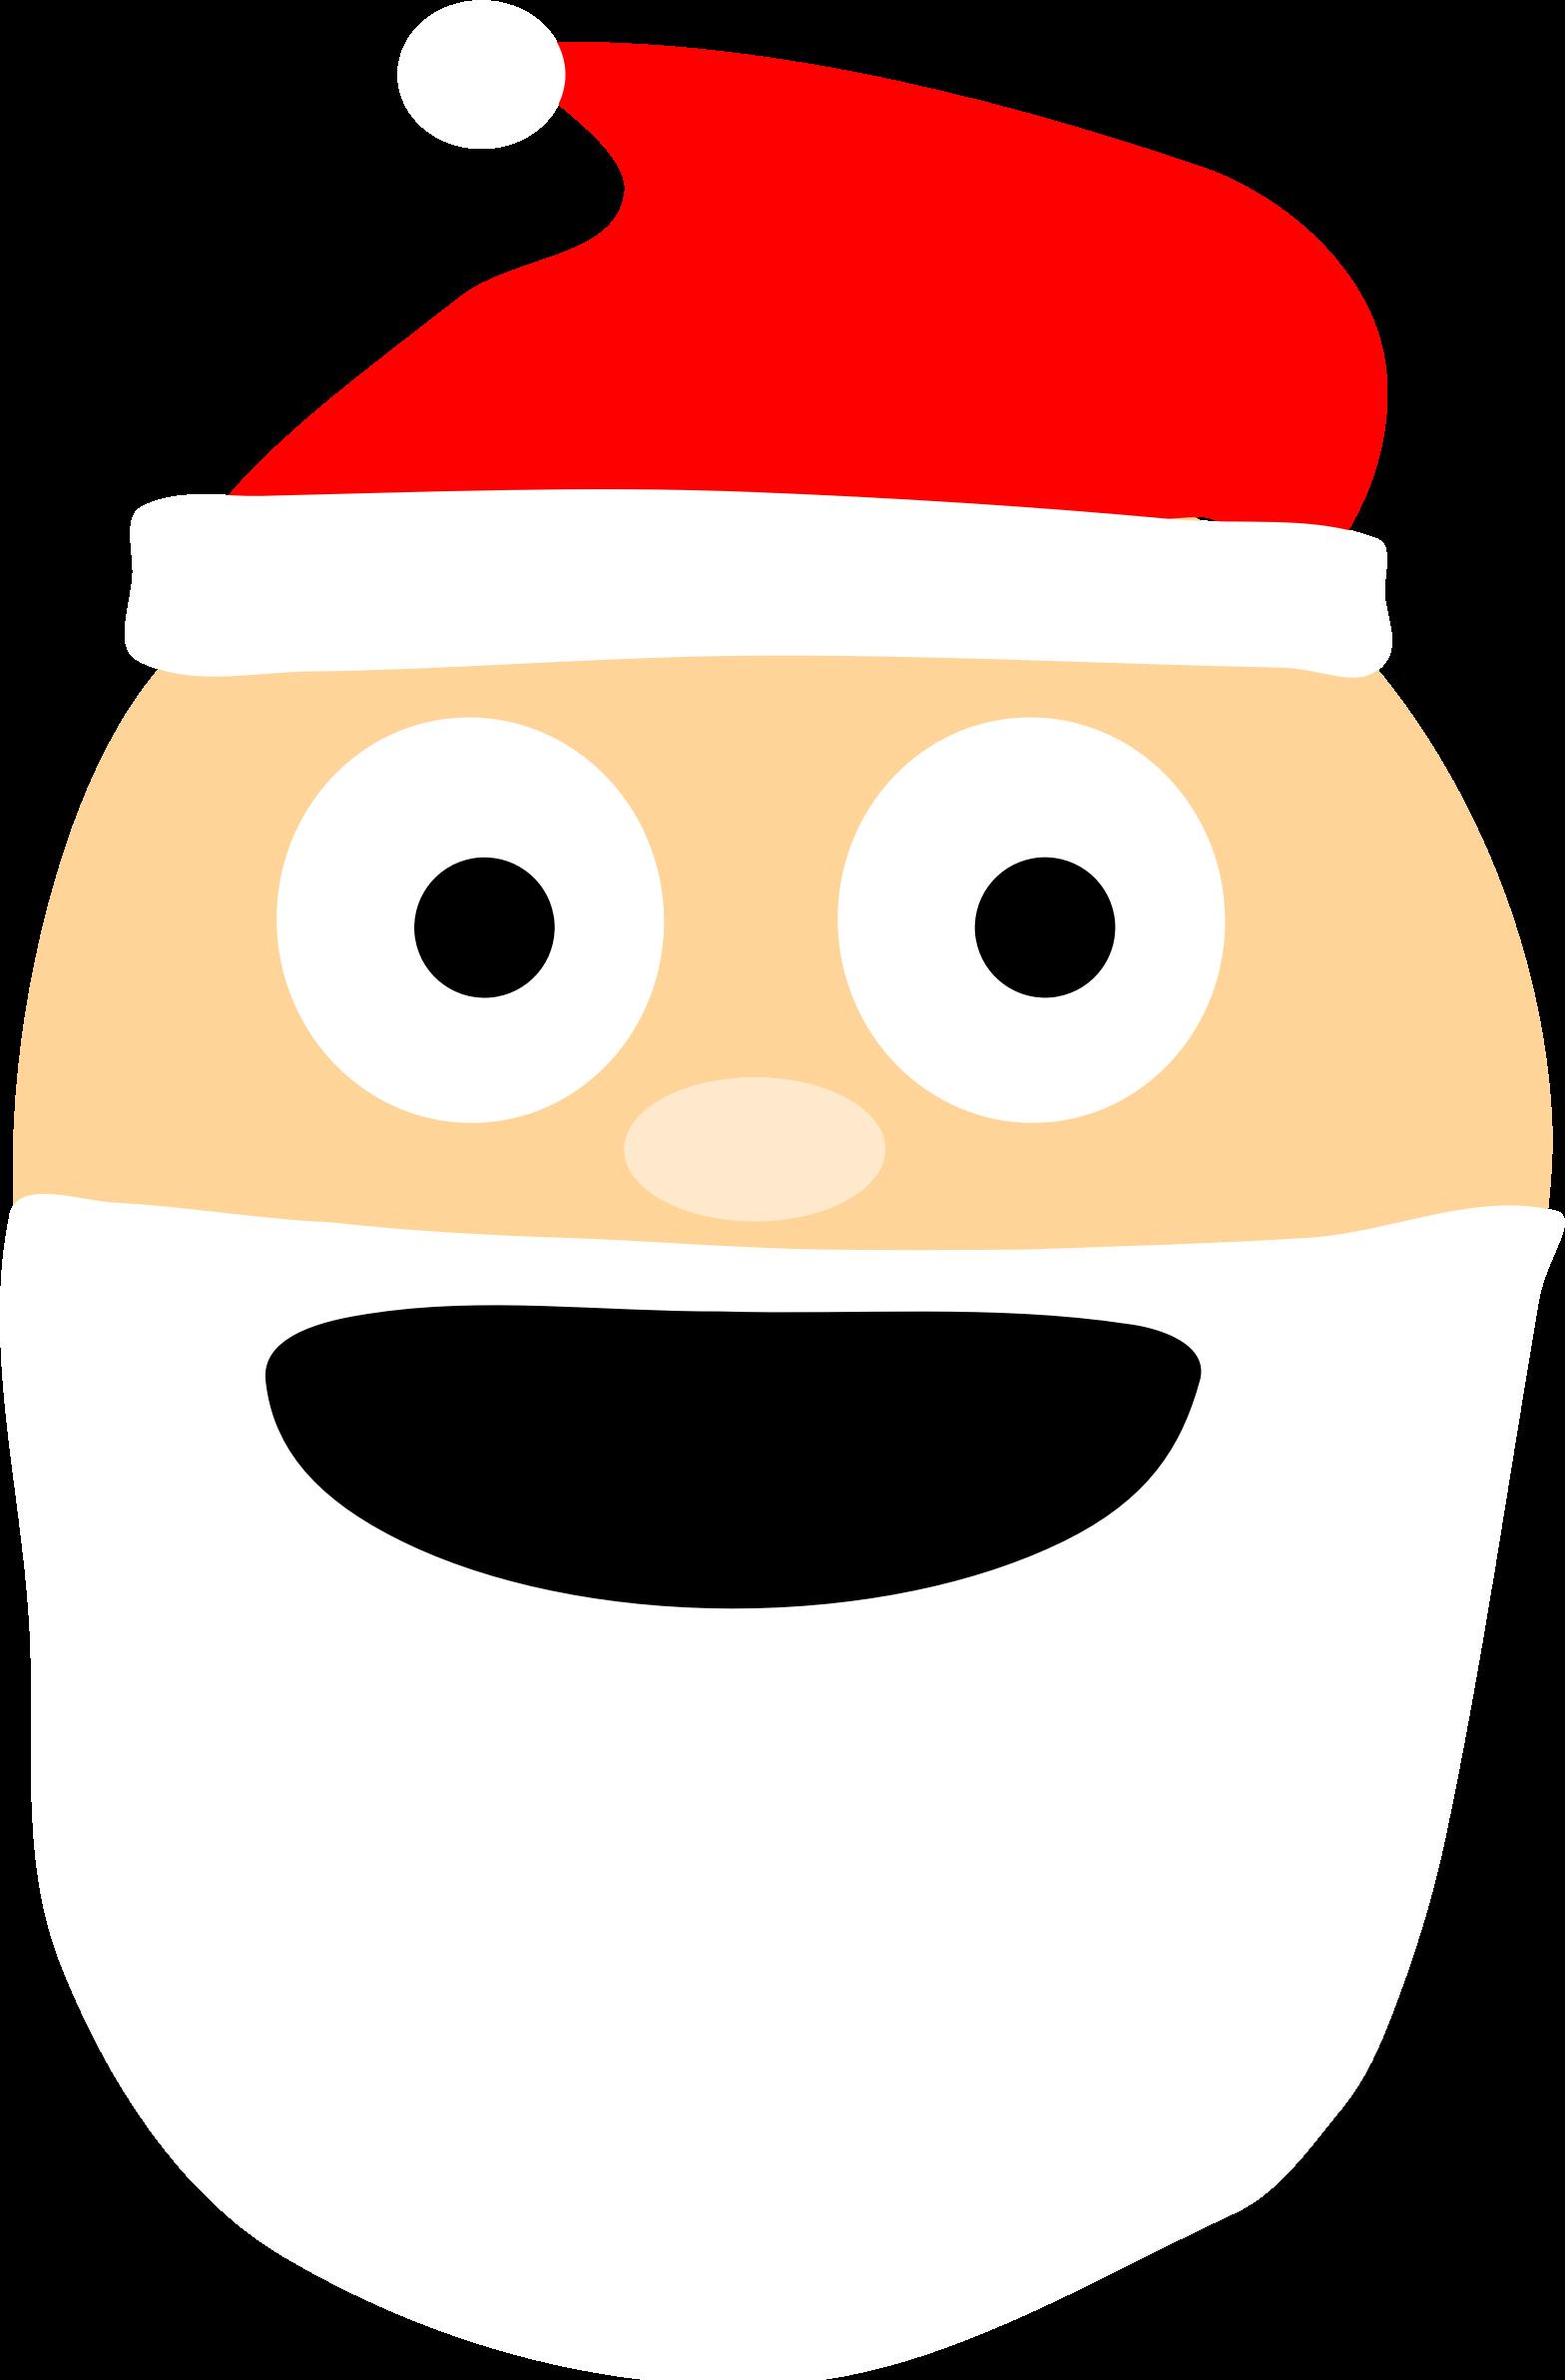 clipart santa emoji apple clip art free coloring apple clip art free downloads